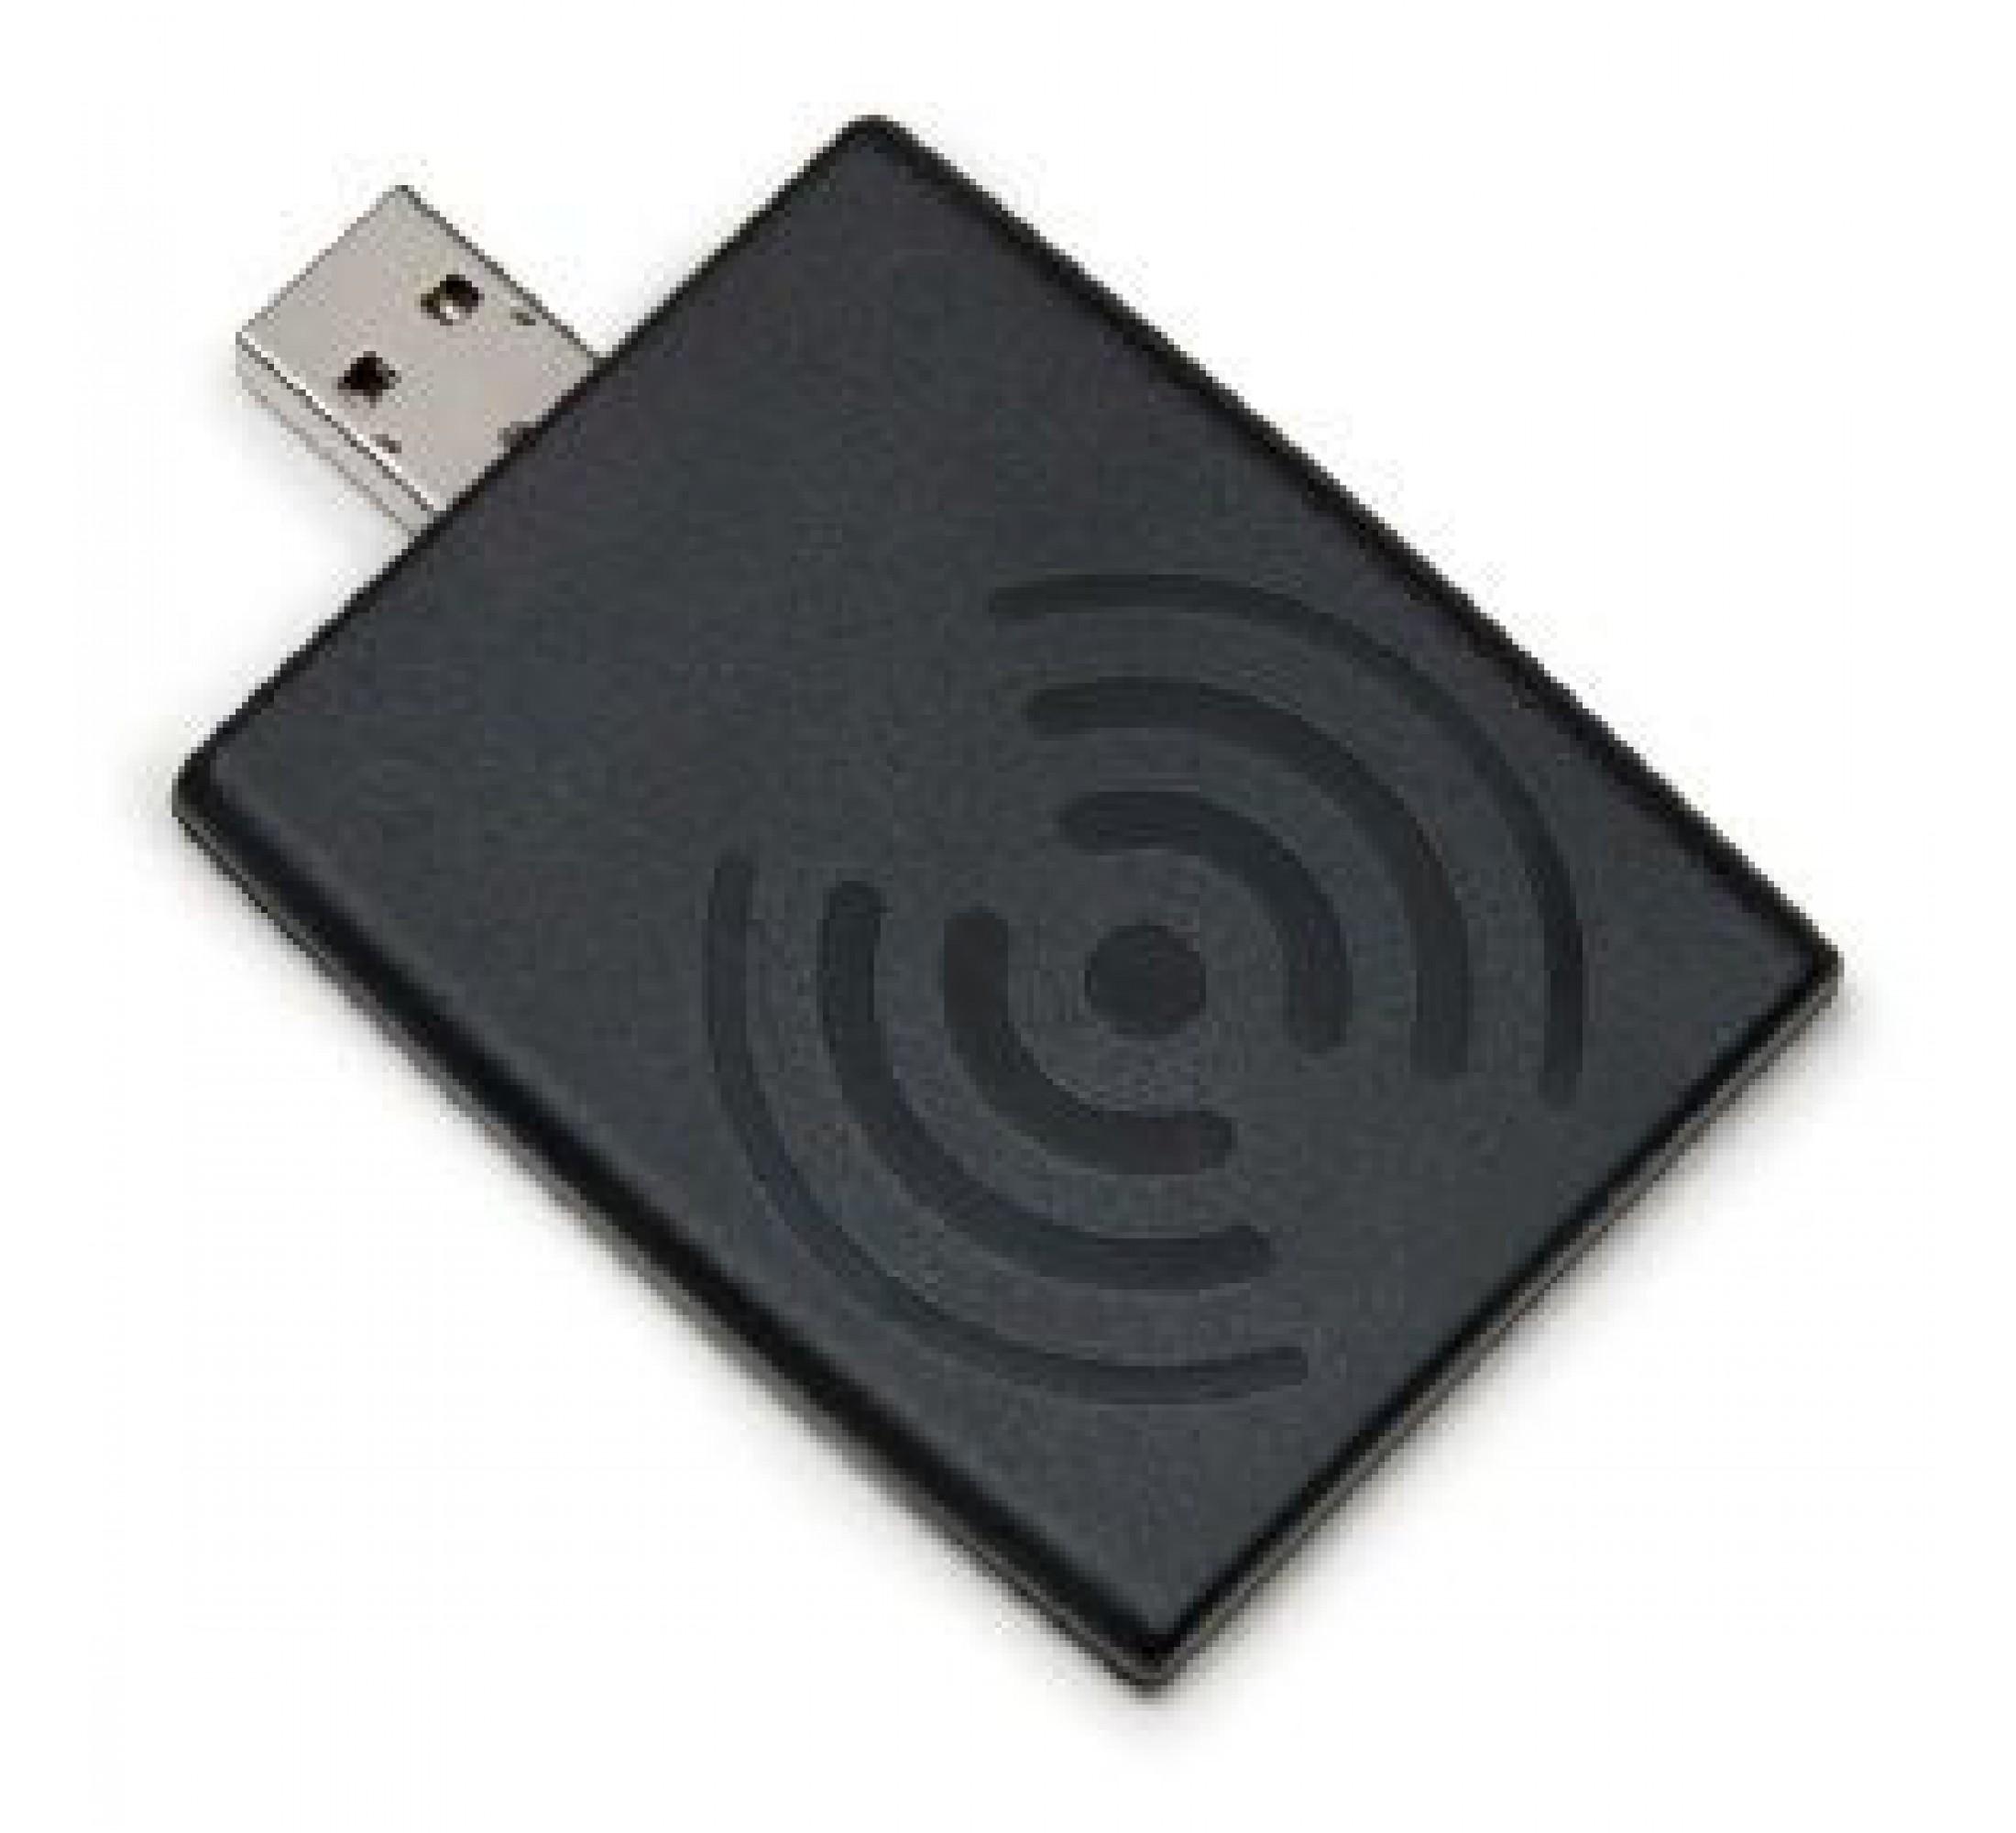 RFID-считыватель Nordic ID STIX